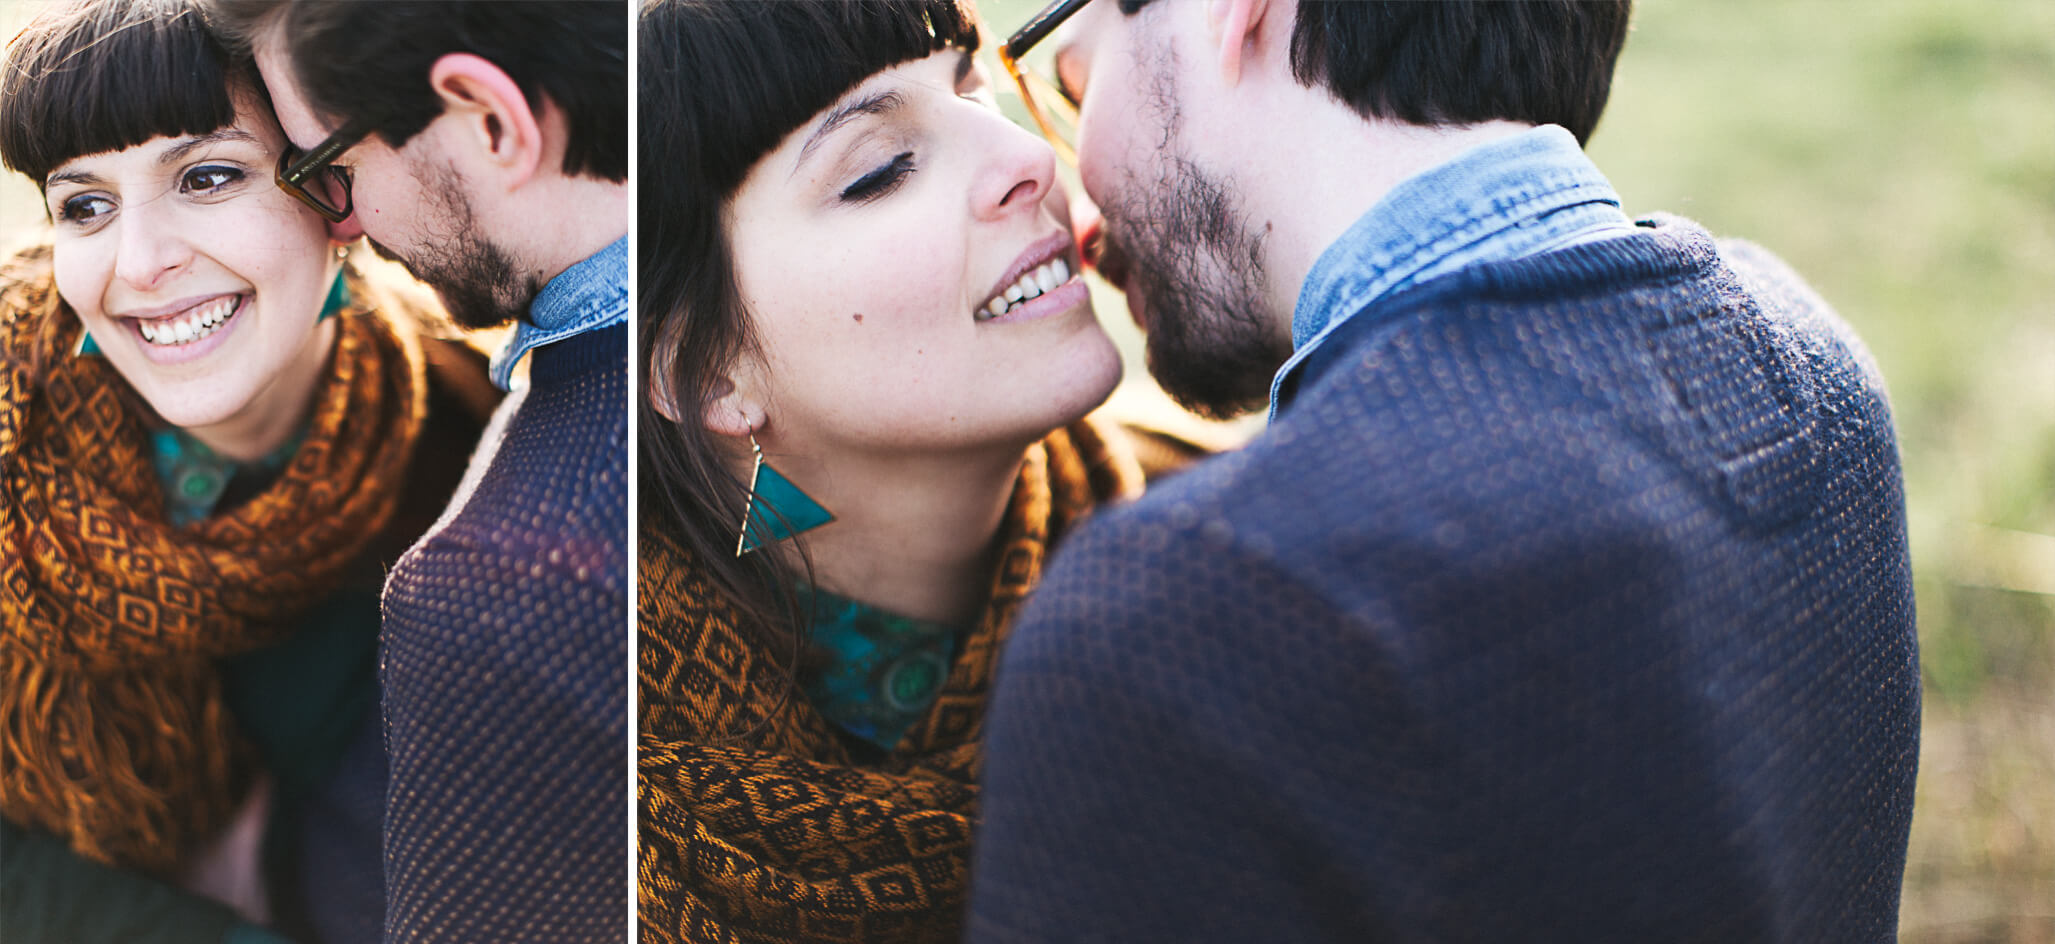 Photographe couple - Andrea & Brice-5-1